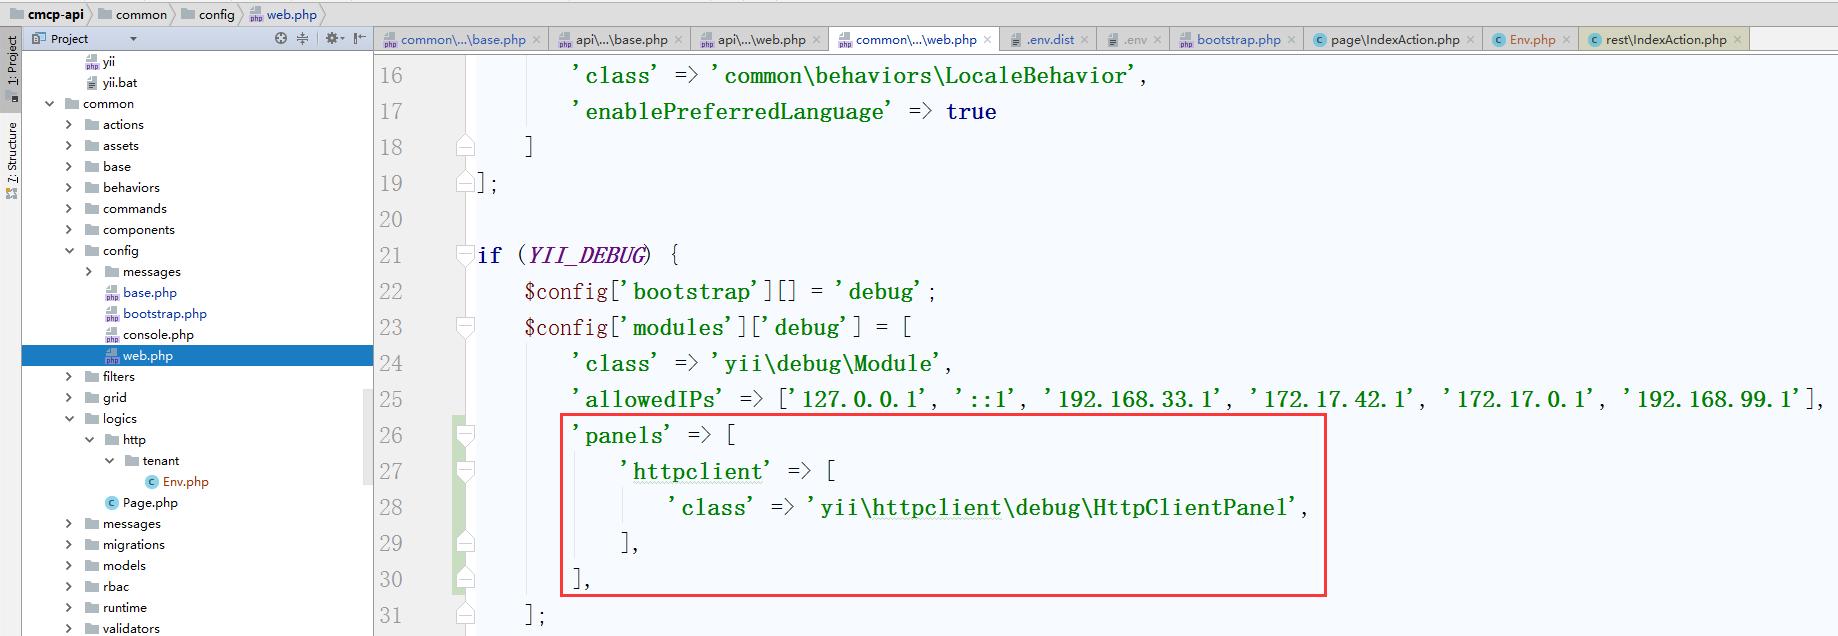 yii2 HTTP 客户端扩展提供了一个可以与 yii 调试模块集成的调试面板,并显示已执行的HTTP 请求,启用调试面板